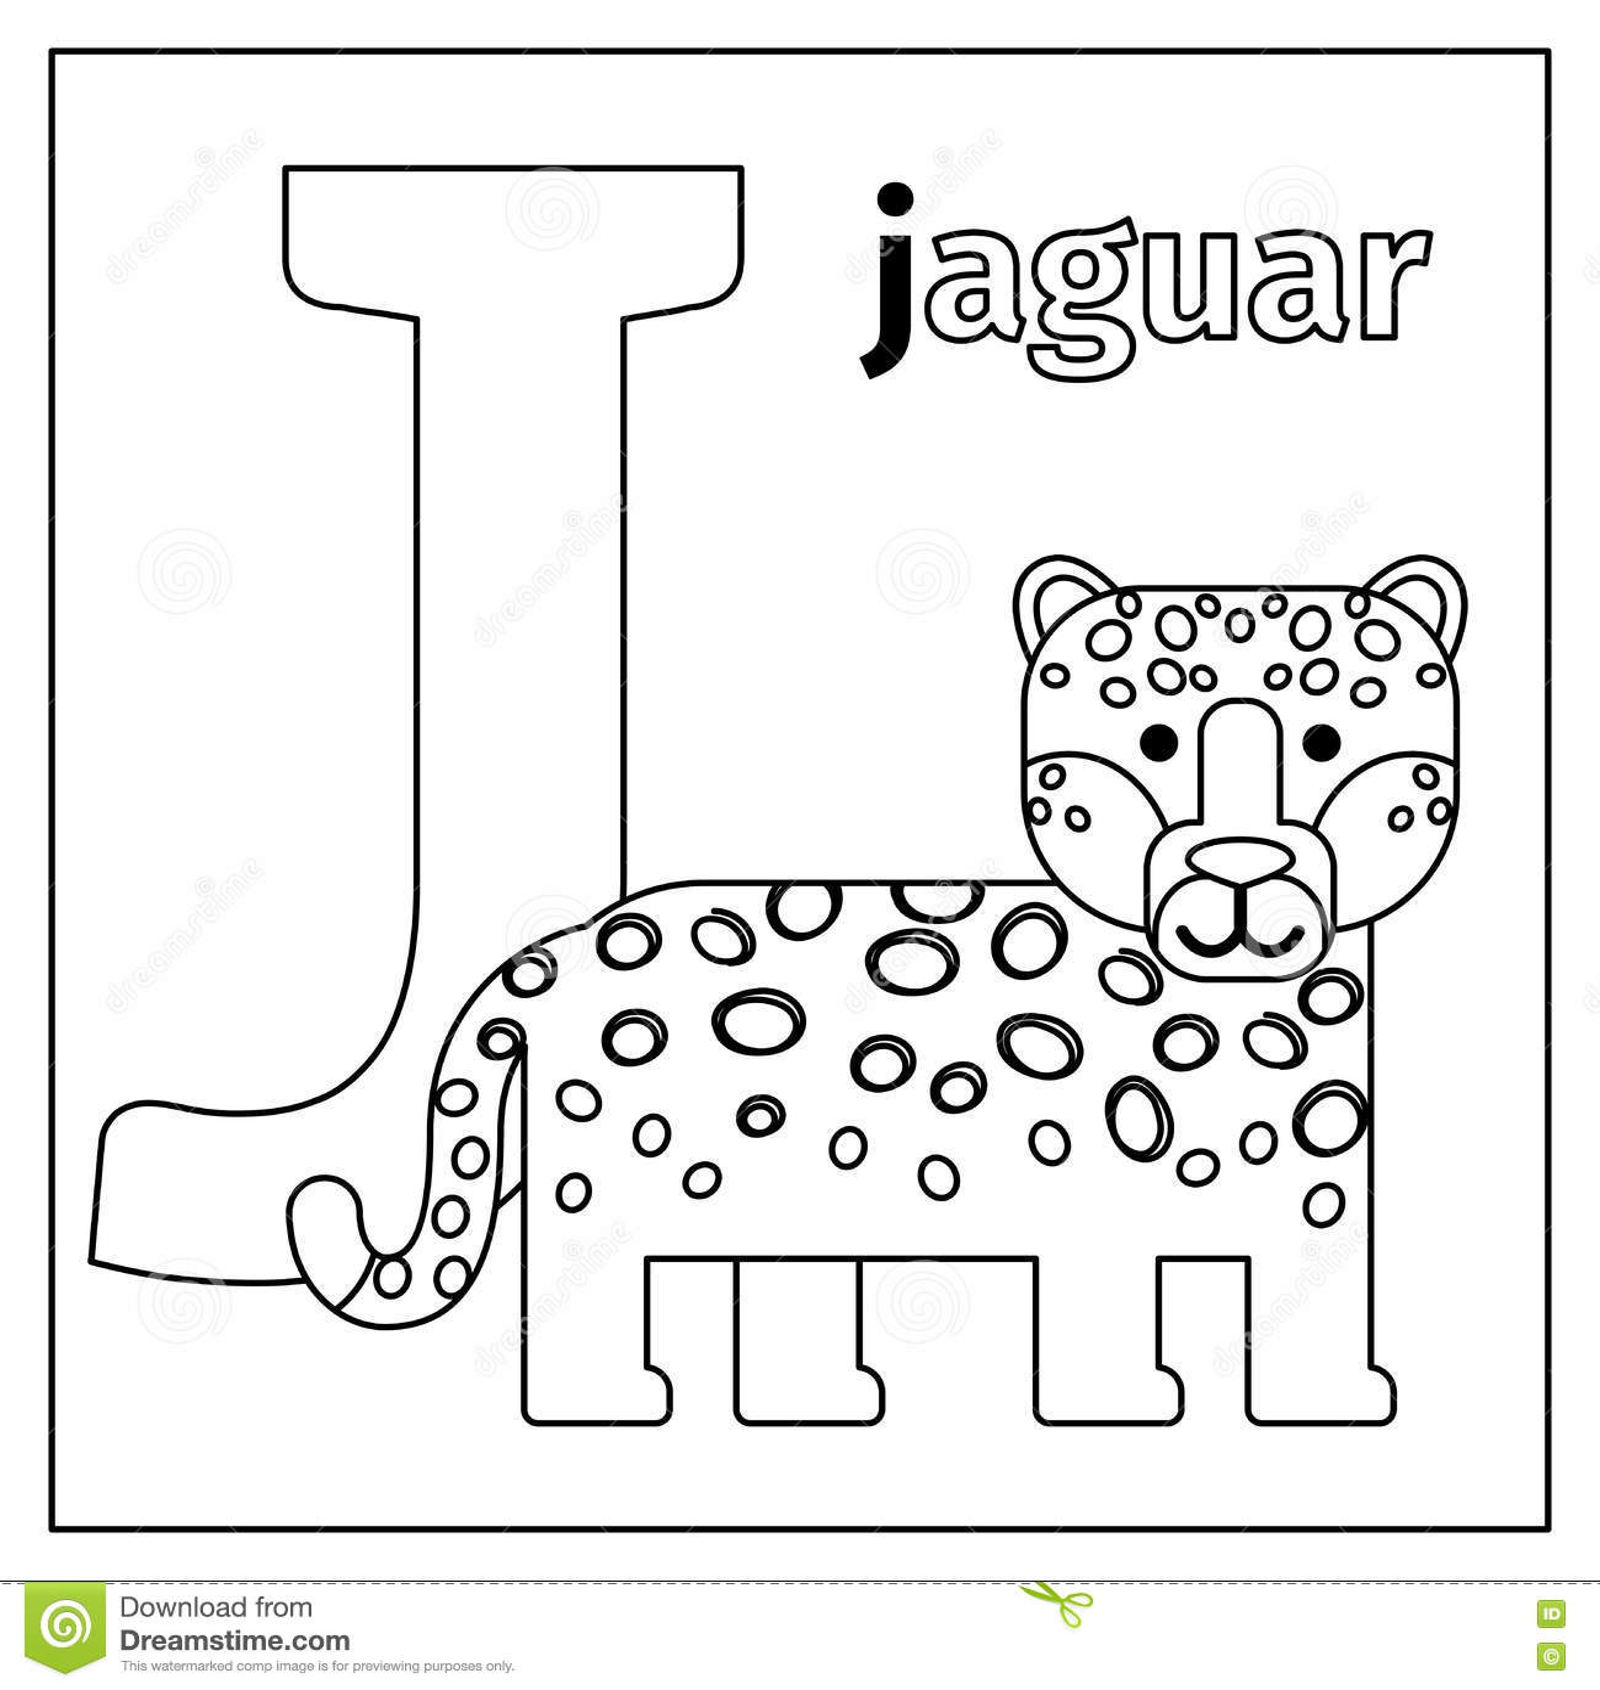 Jaguar Letter J Coloring Page Stock Vector